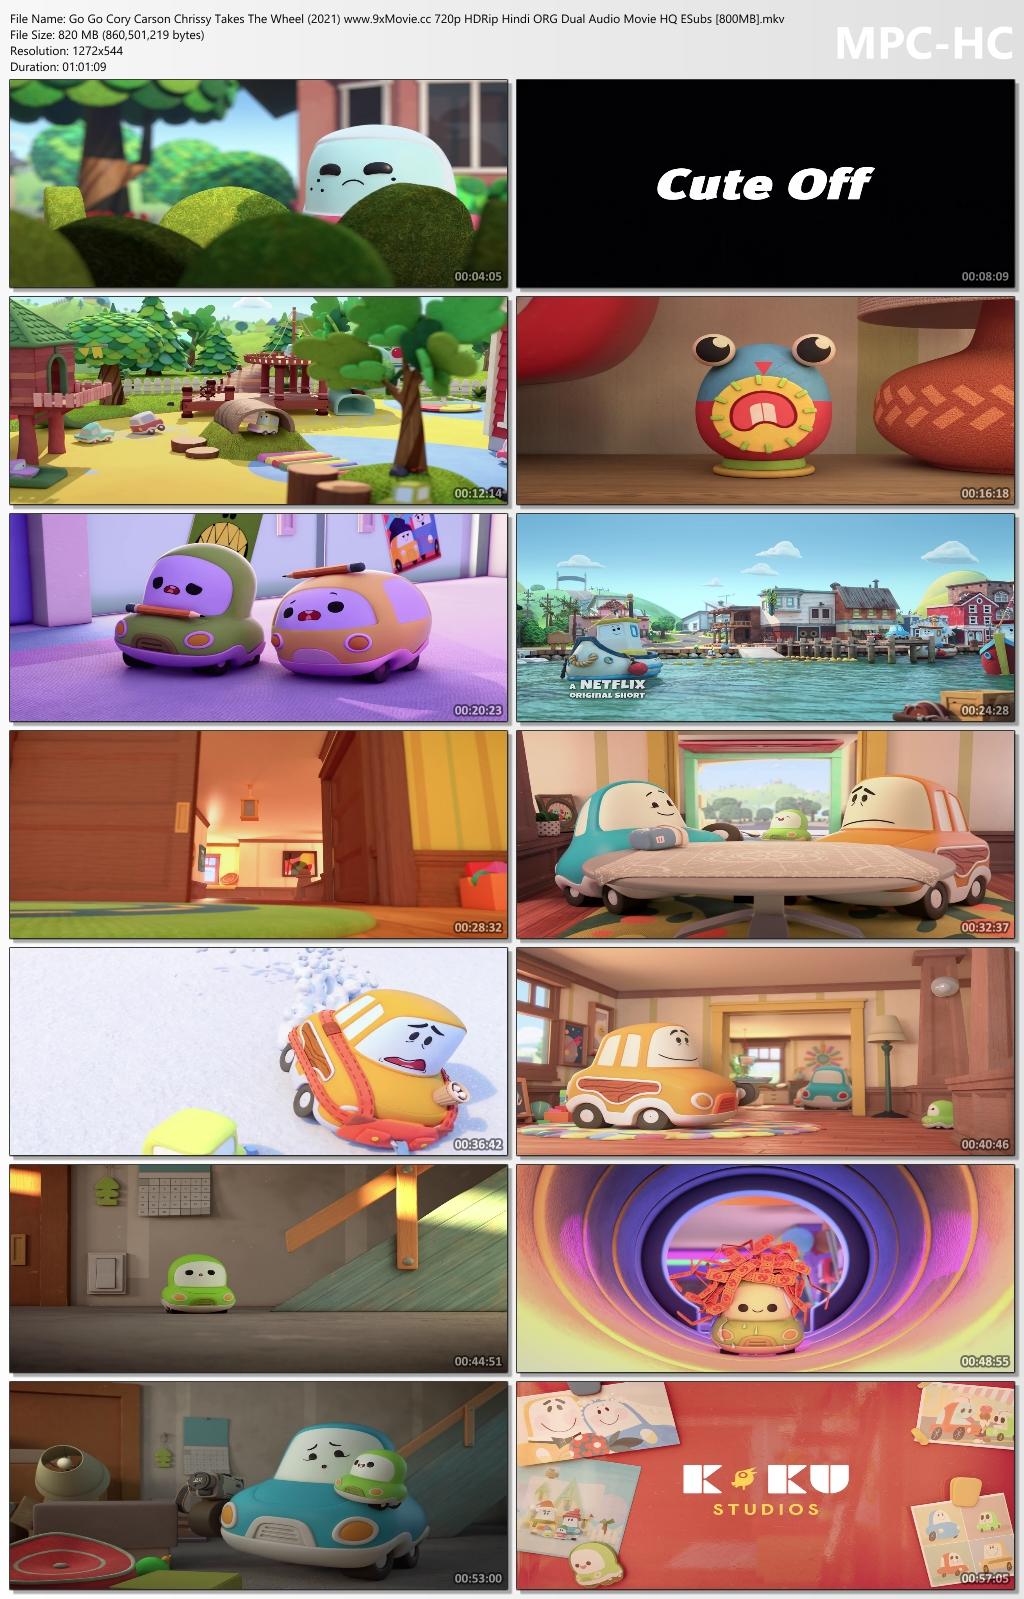 Go-Go-Cory-Carson-Chrissy-Takes-The-Wheel-2021-www-9x-Movie-cc-720p-HDRip-Hindi-ORG-Dual-Audio-Movie